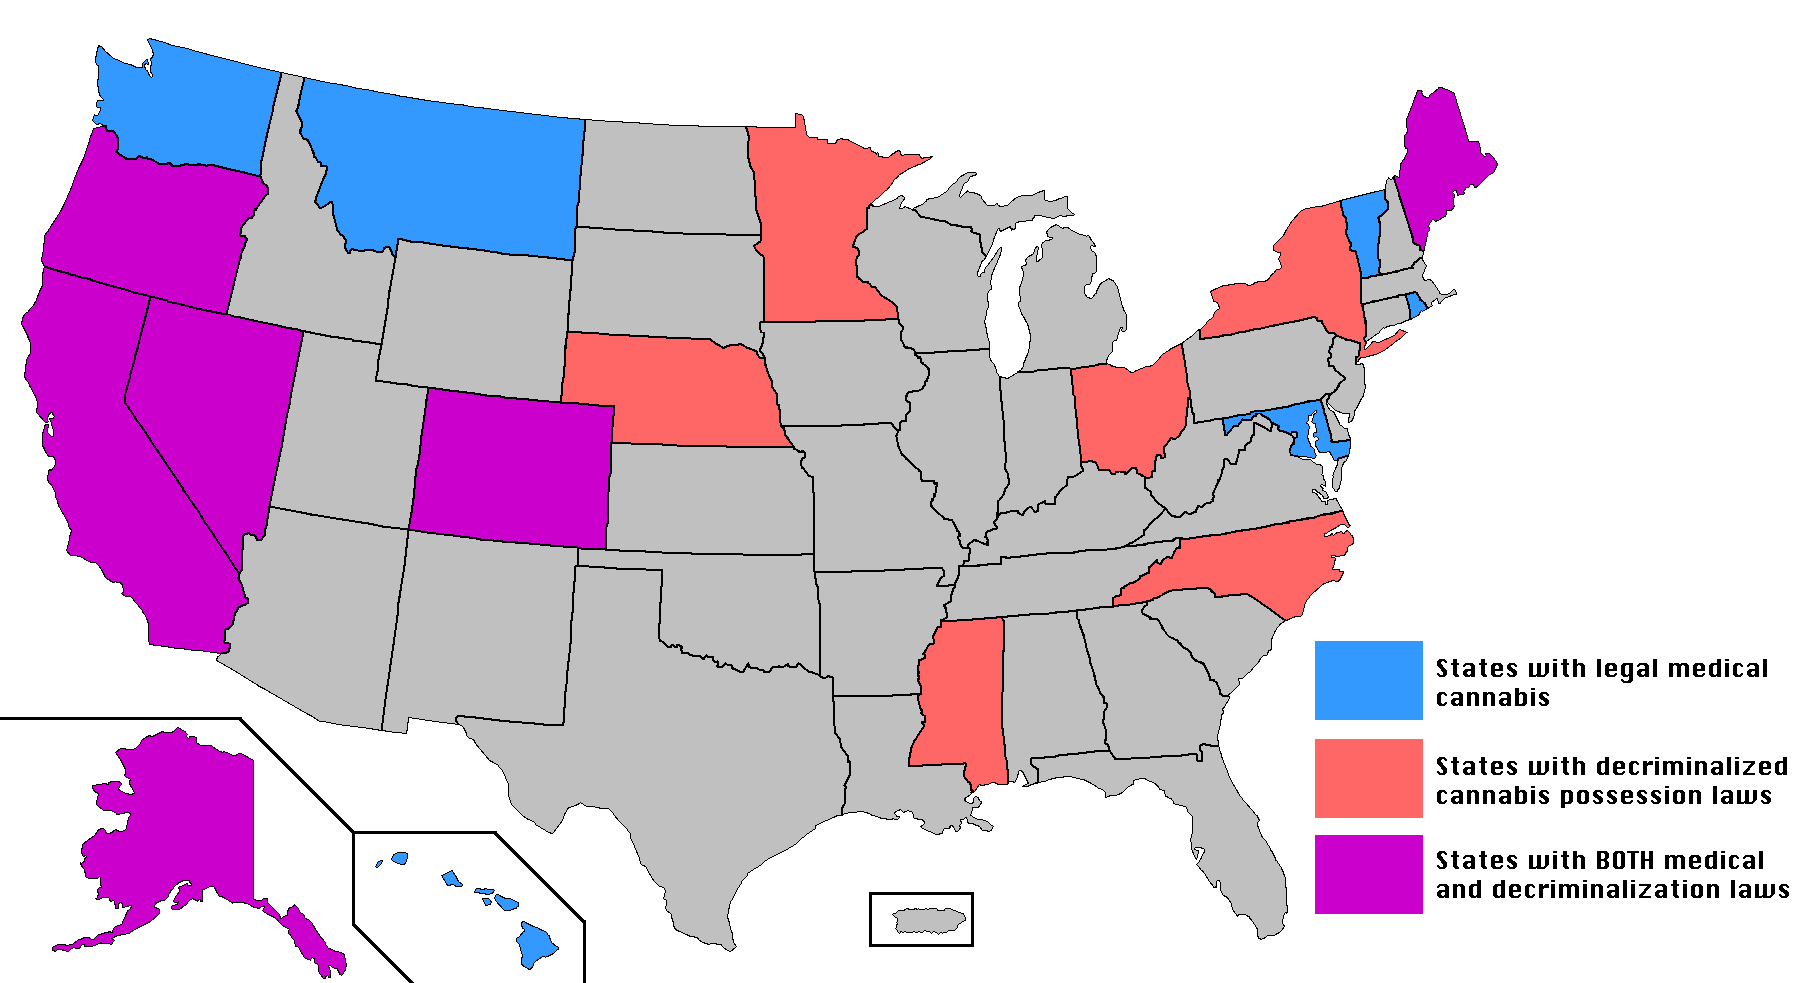 Overview of U.S. Medical Marijuana Law